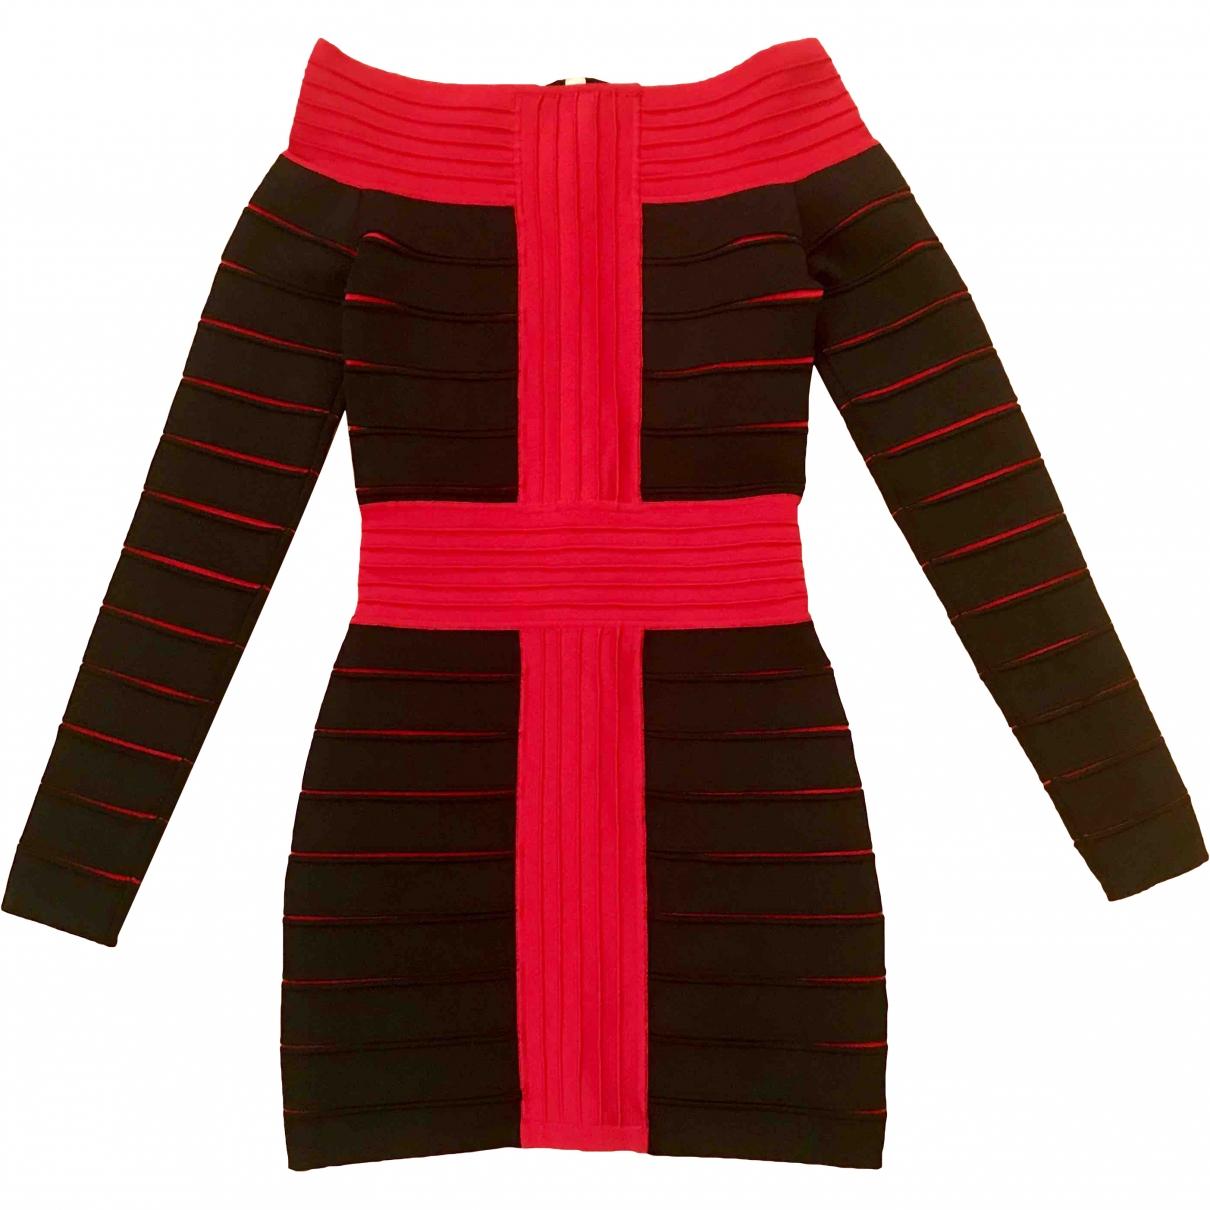 Balmain \N Multicolour dress for Women XS International